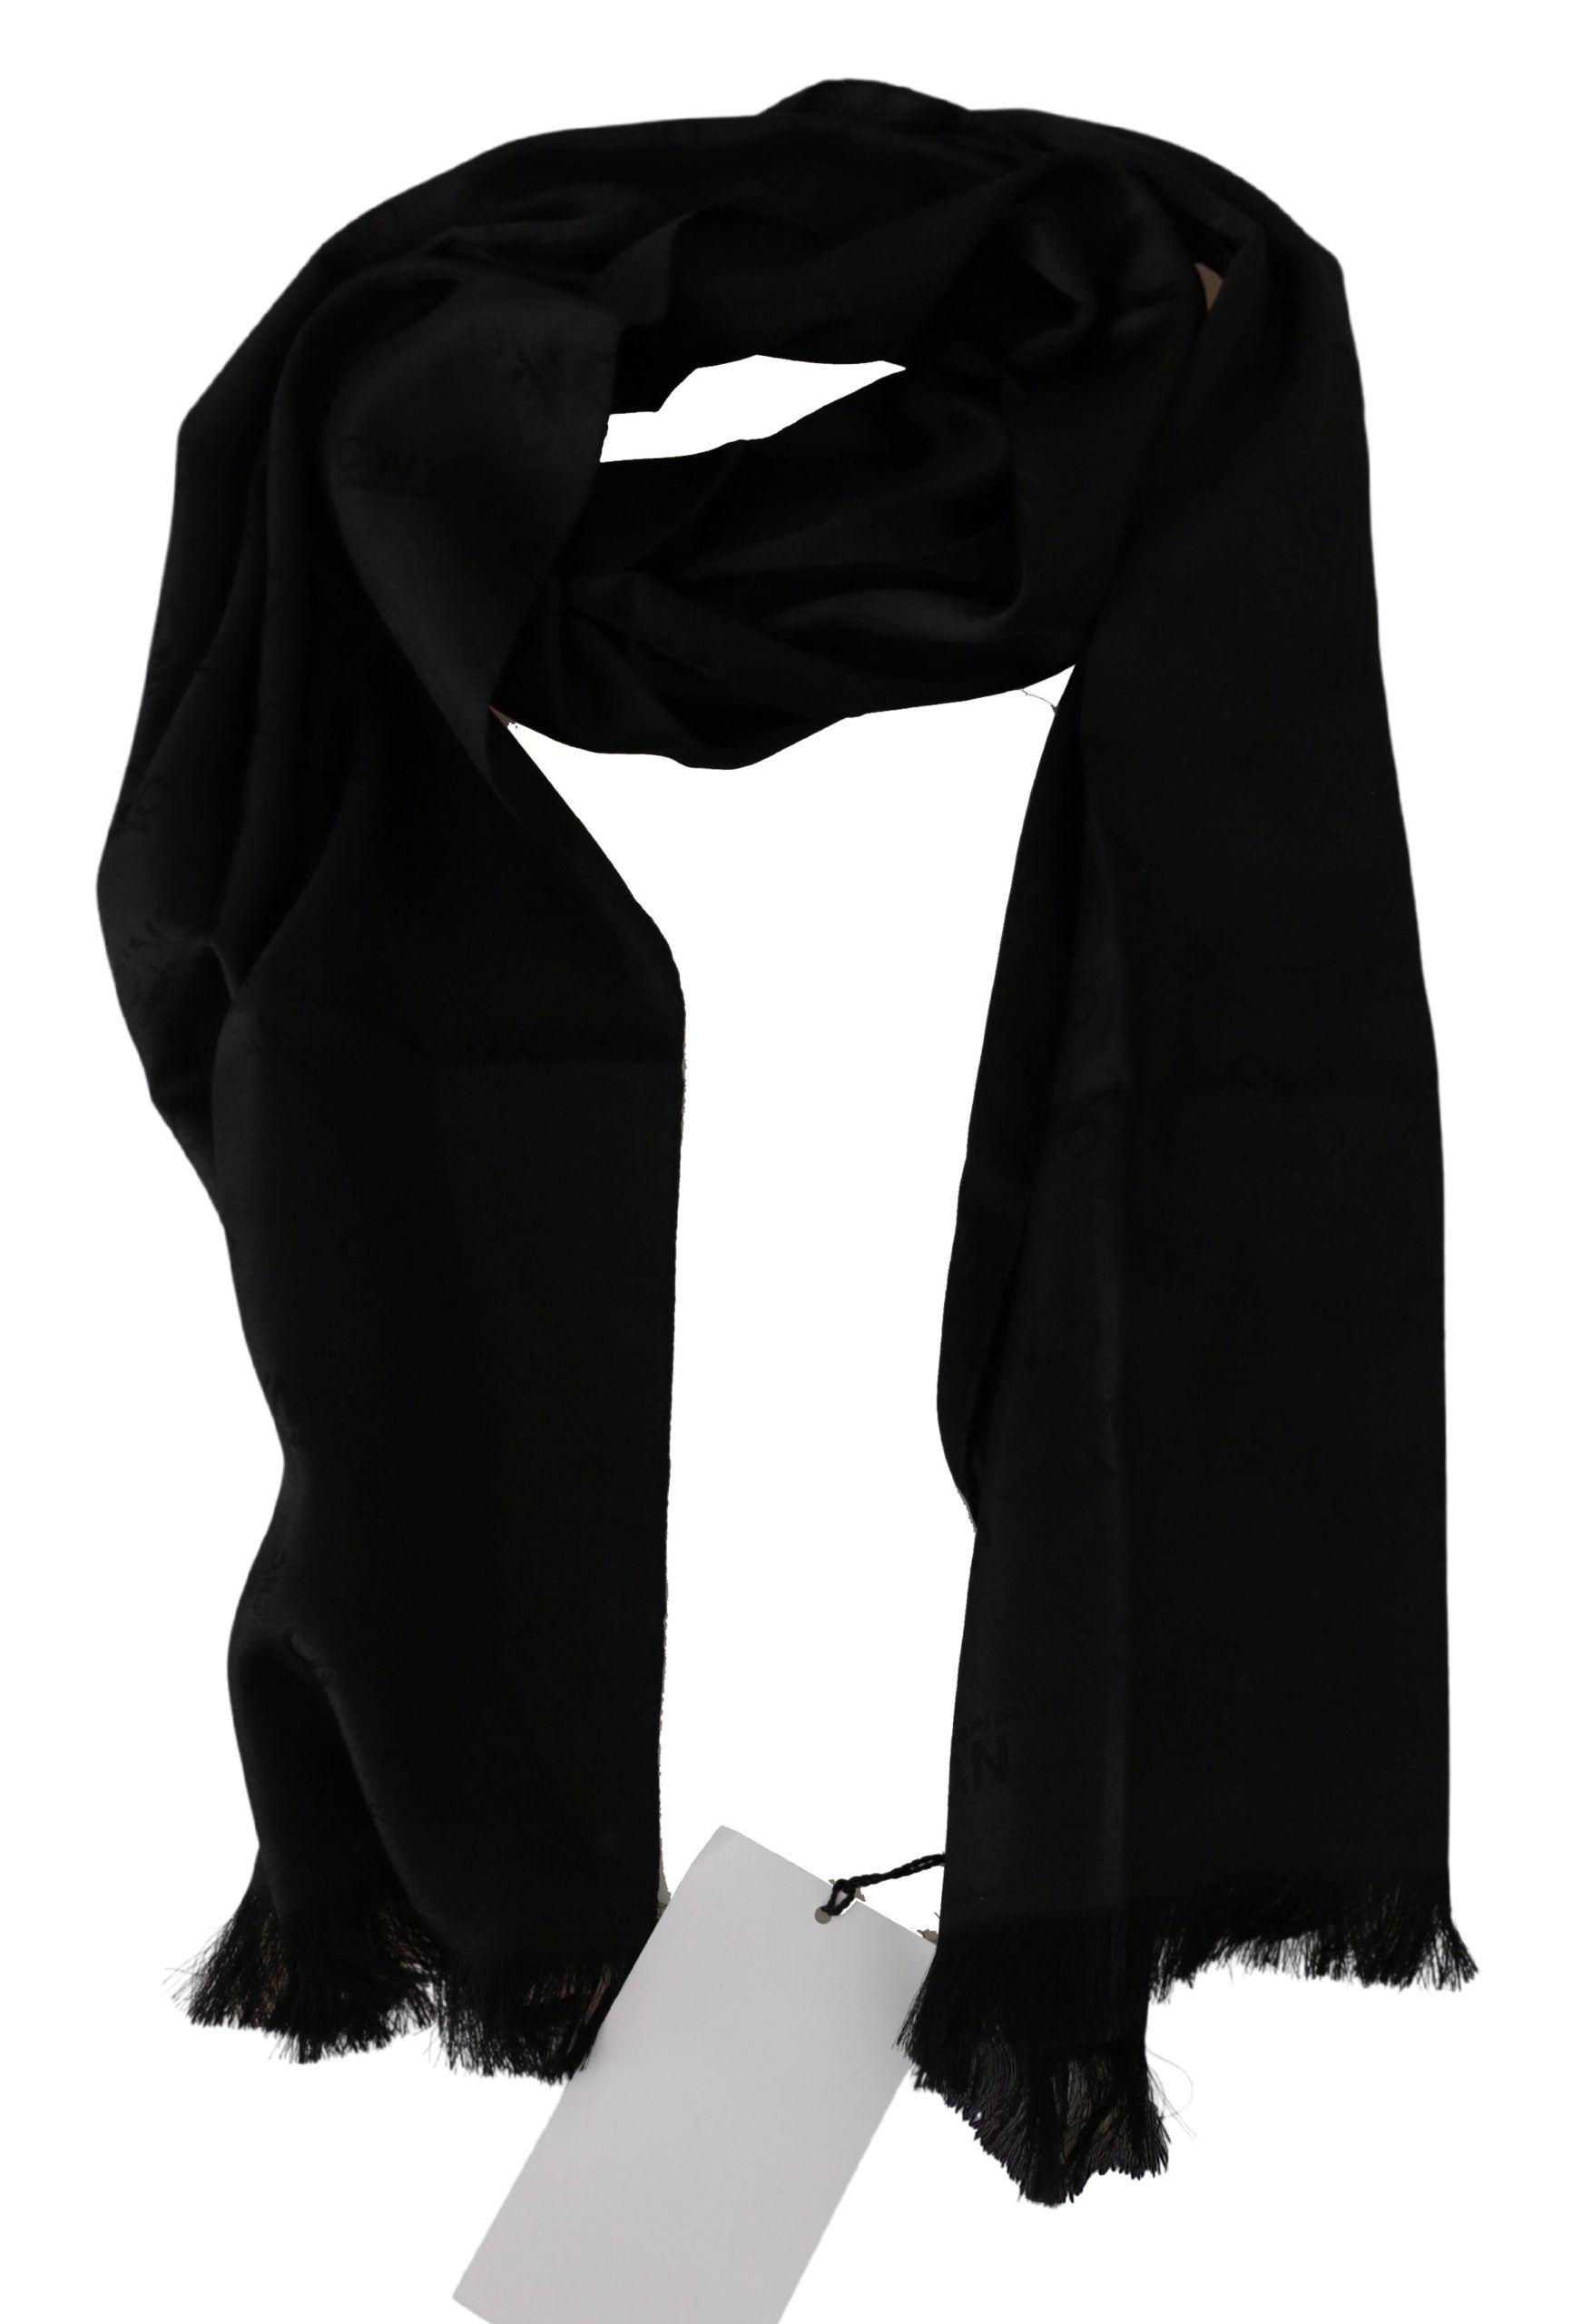 Dolce & Gabbana White Waistcoat Formal Wool  Vest